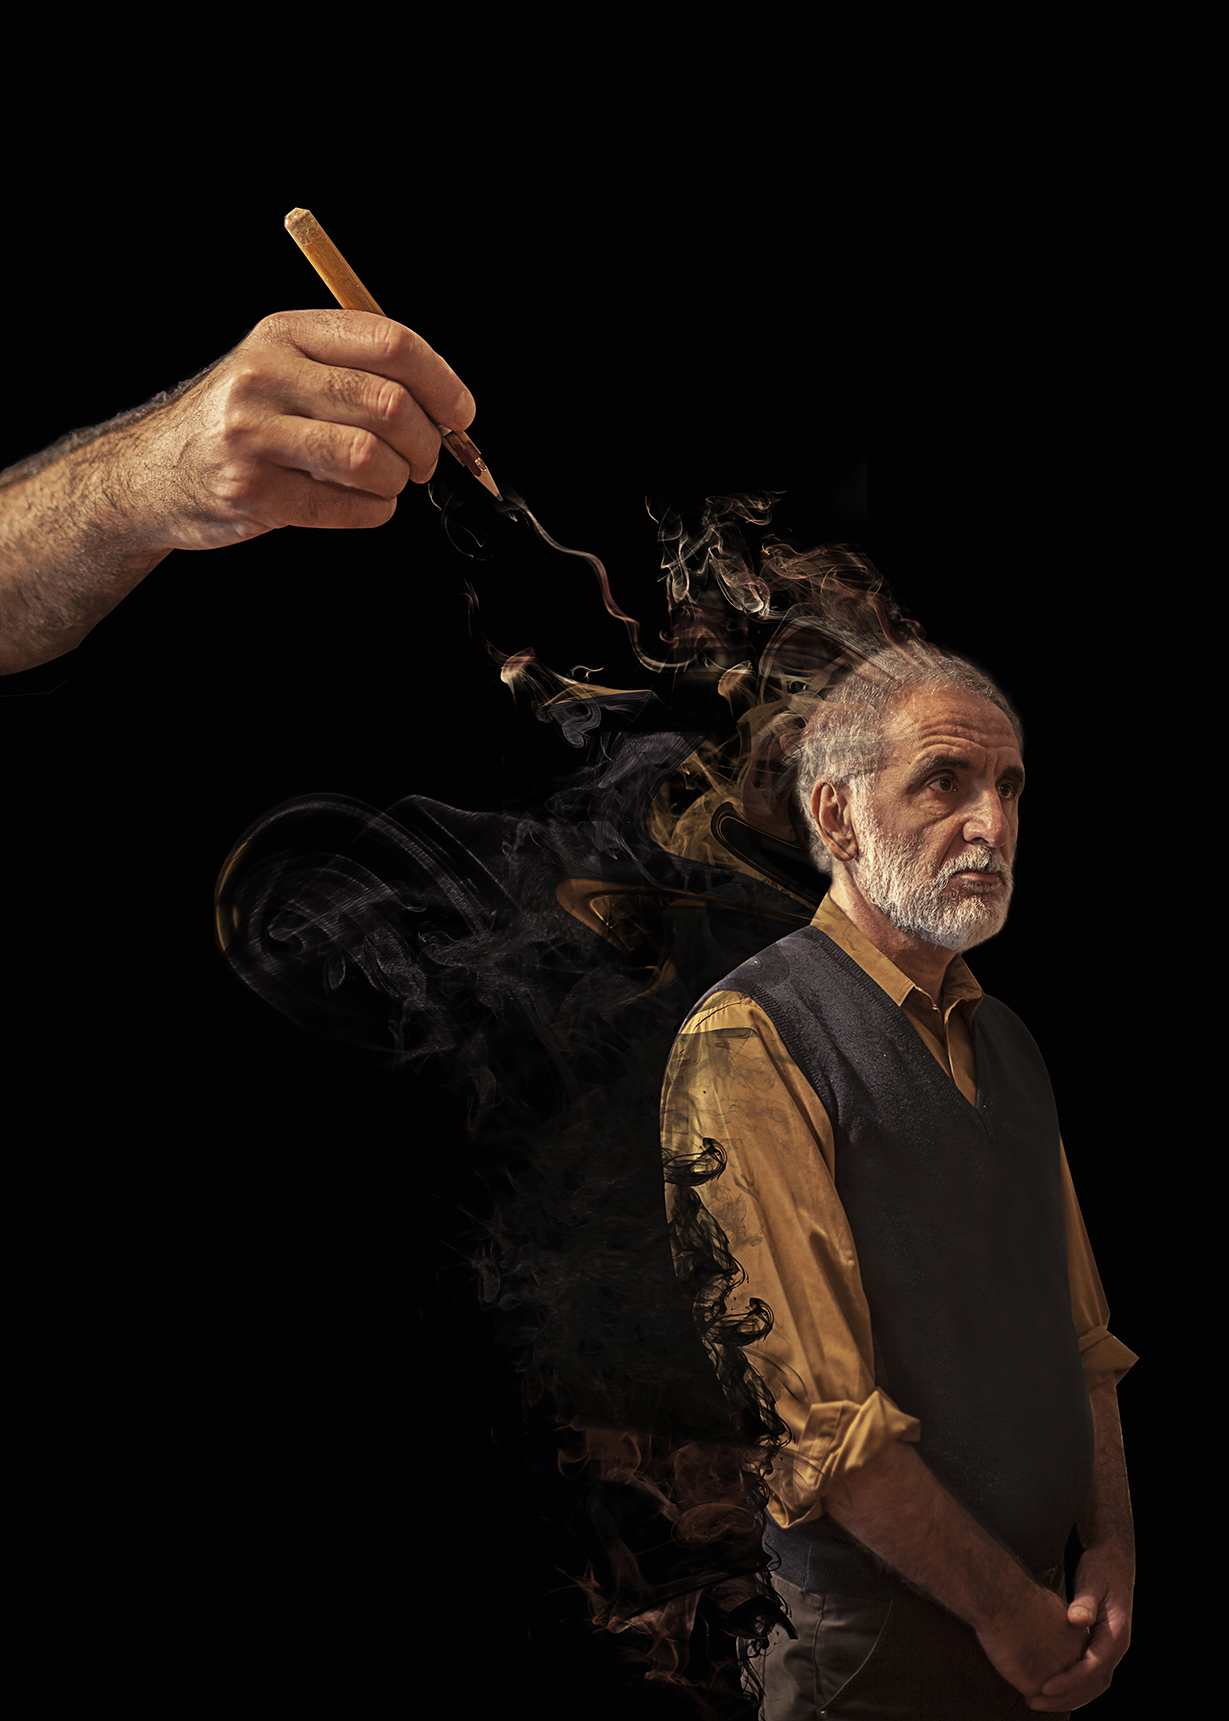 michele mari, italian writer, creative photography, fine art